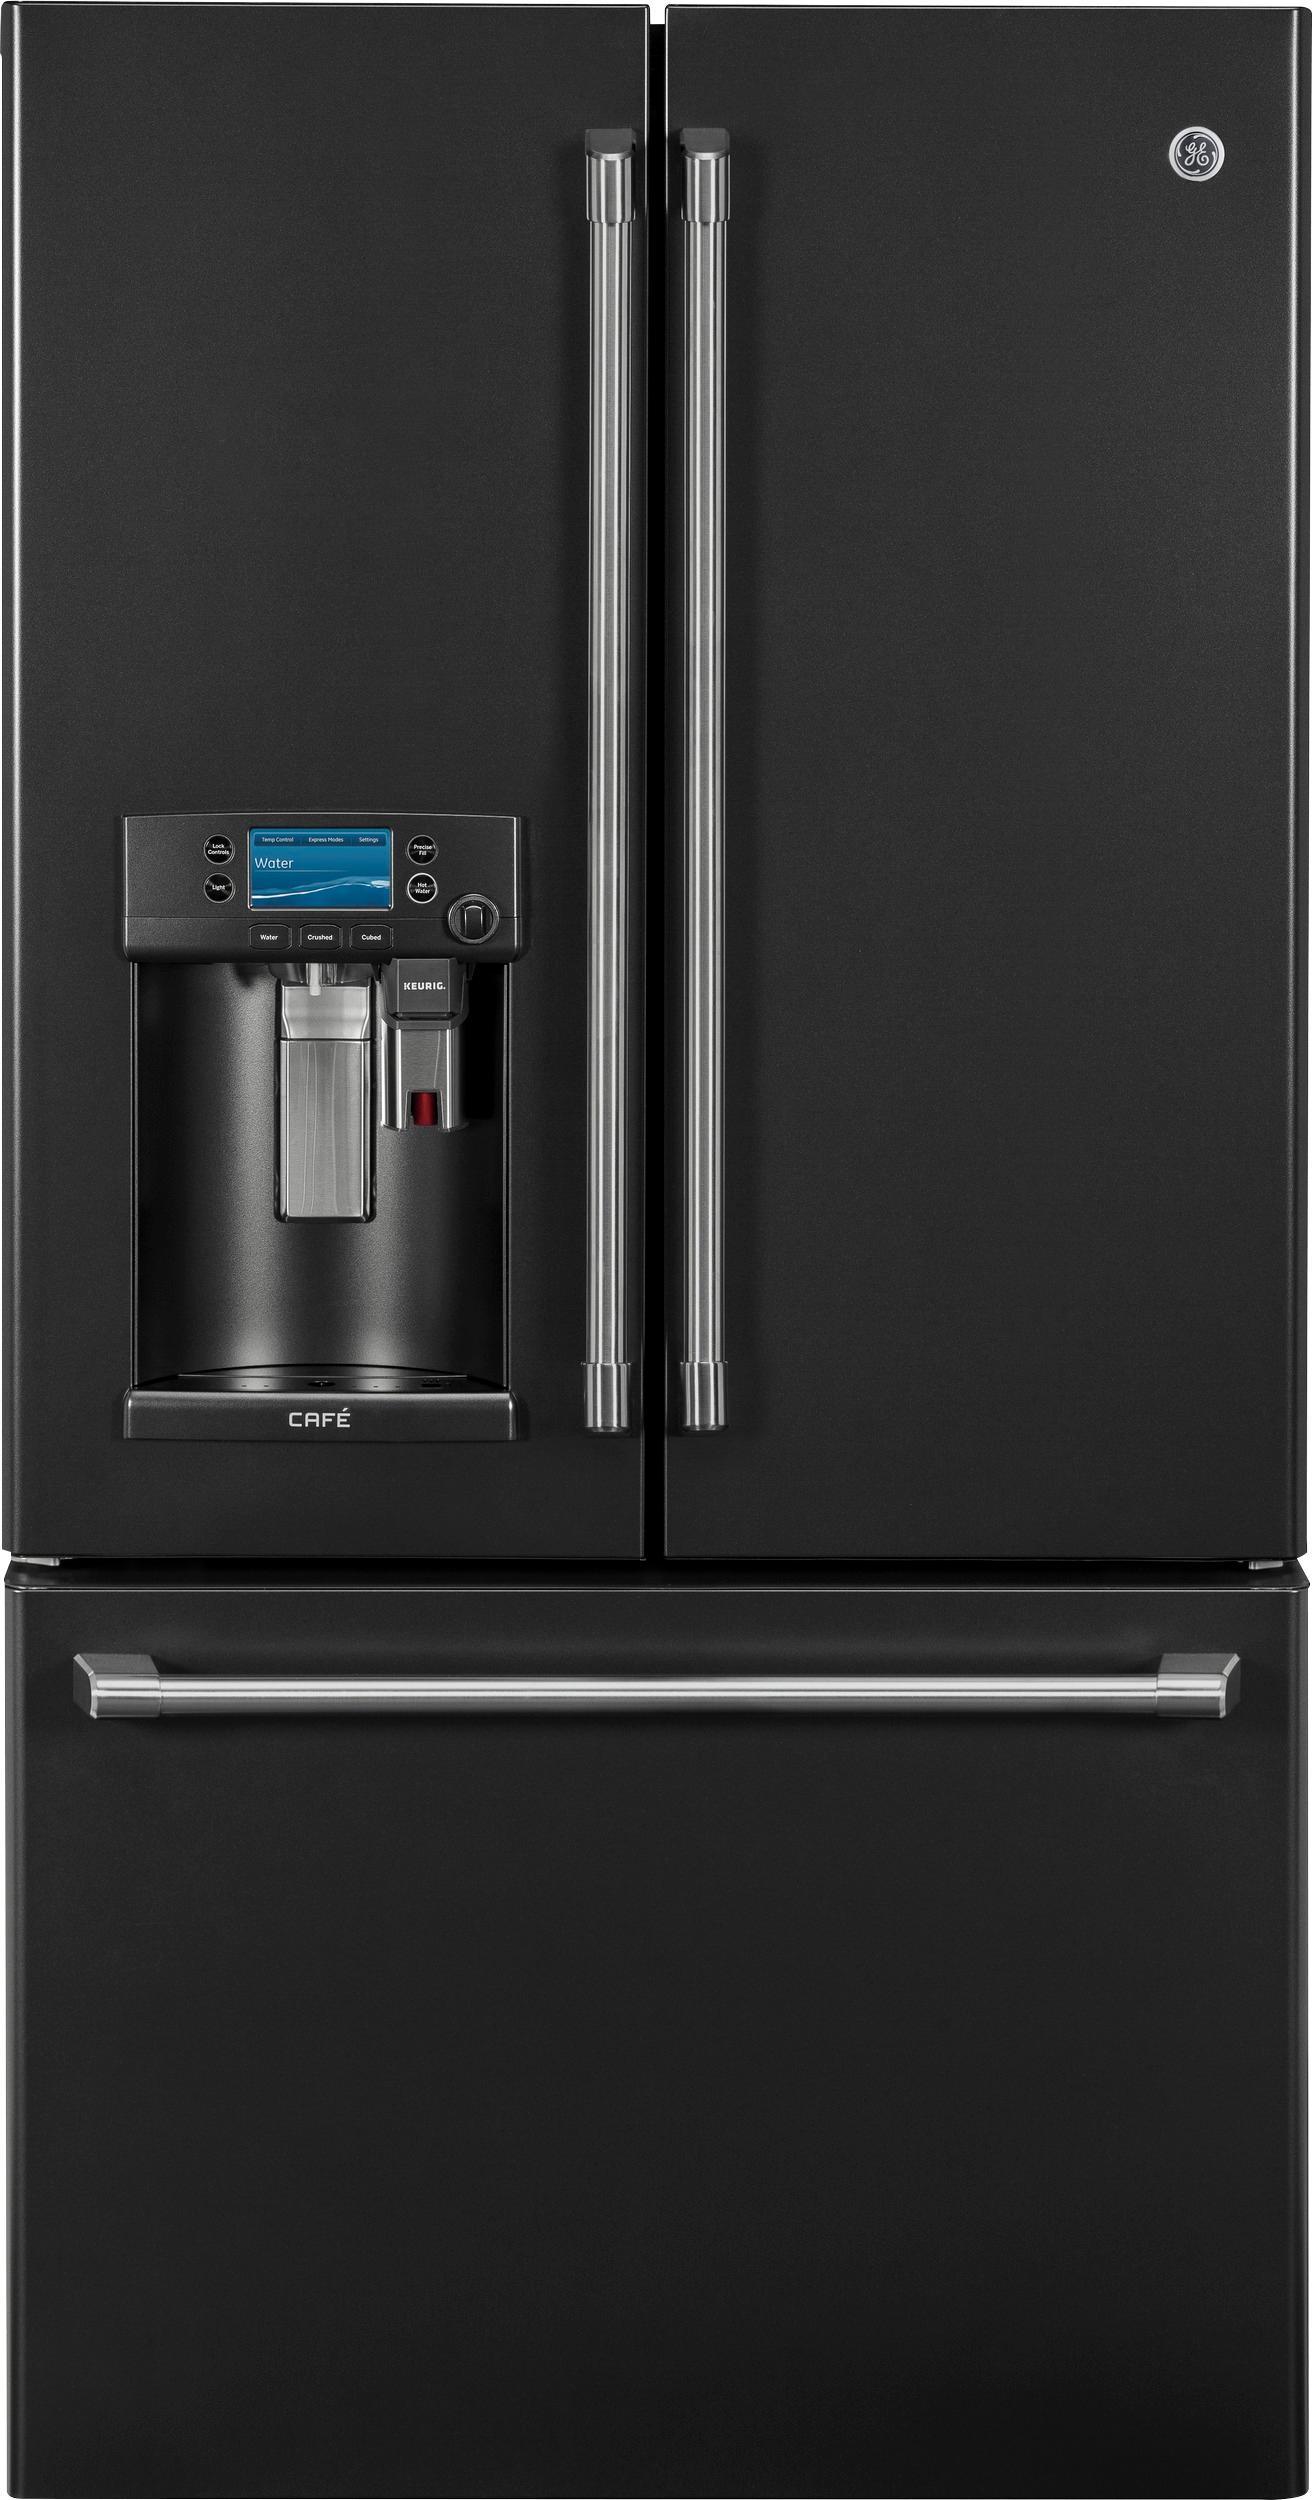 GE - Café Series 22.2 Cu. Ft. French Door Counter-Depth Refrigerator with Keurig Brewing System - Black Slate largeFrontImage